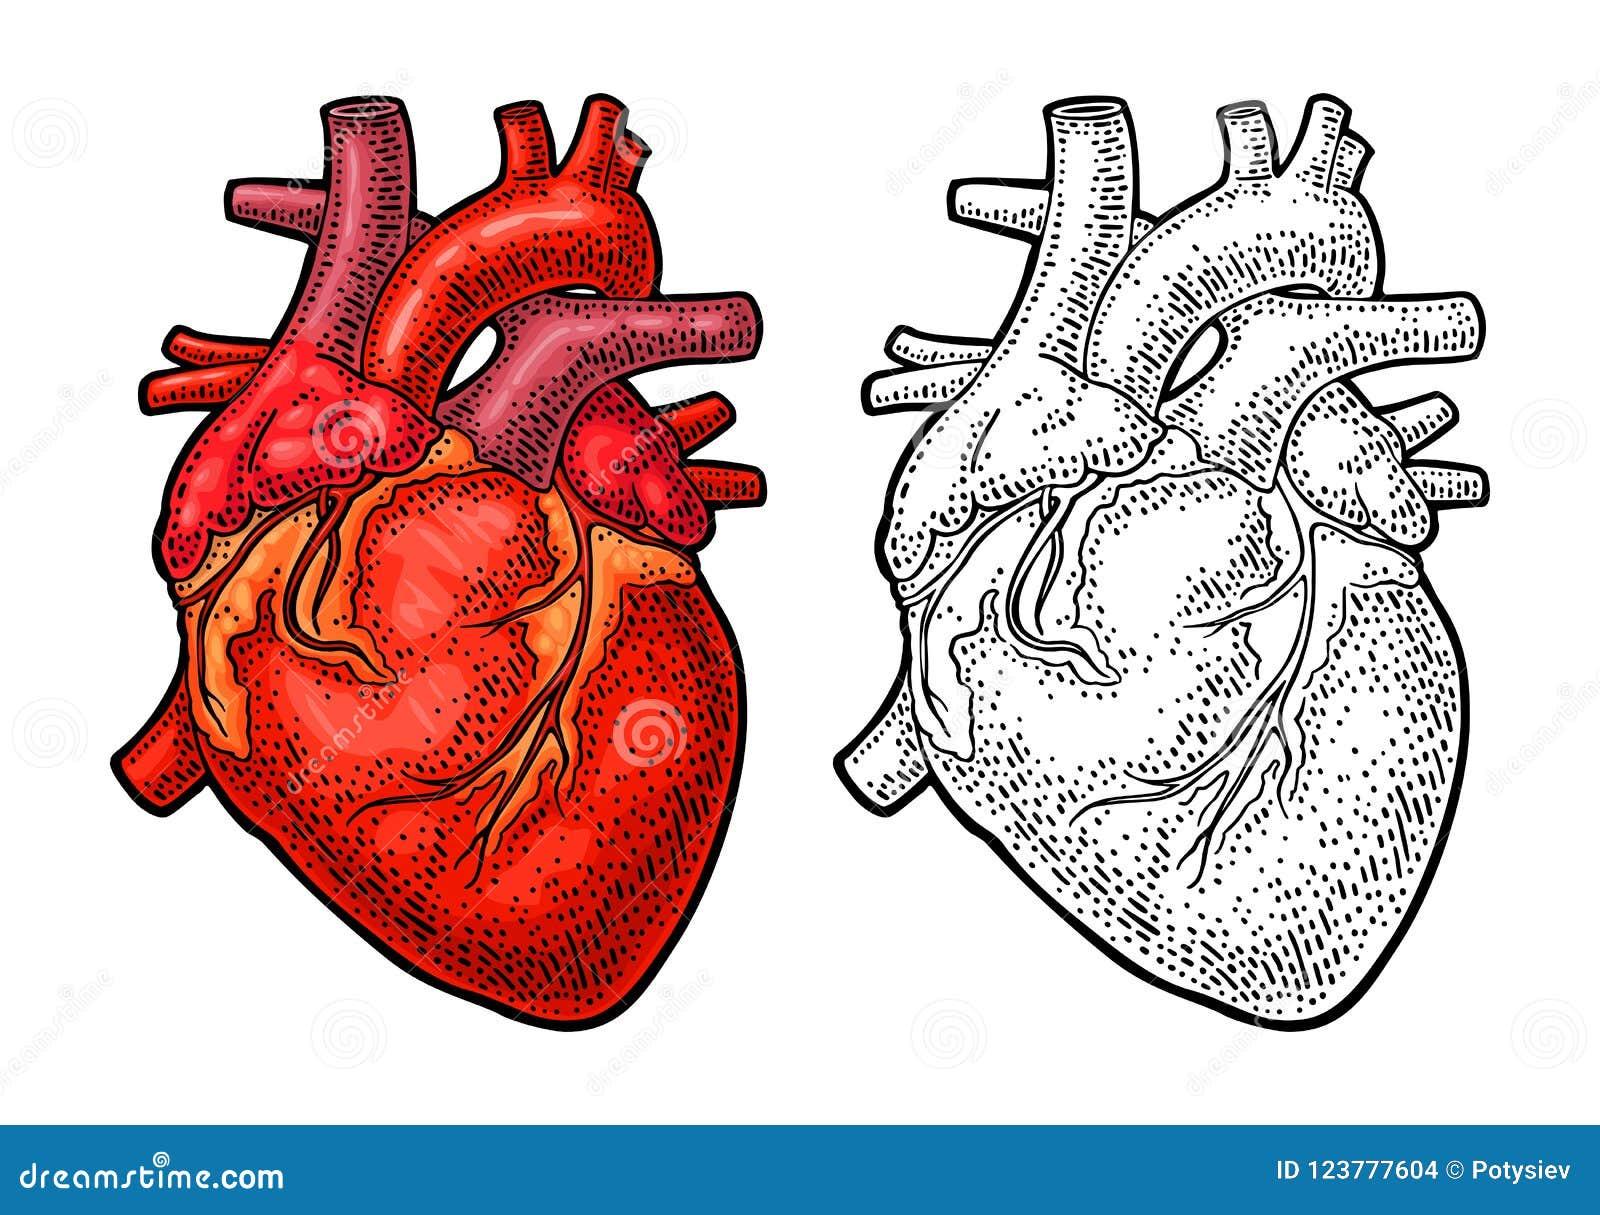 Human anatomy heart. Vector color vintage engraving illustration